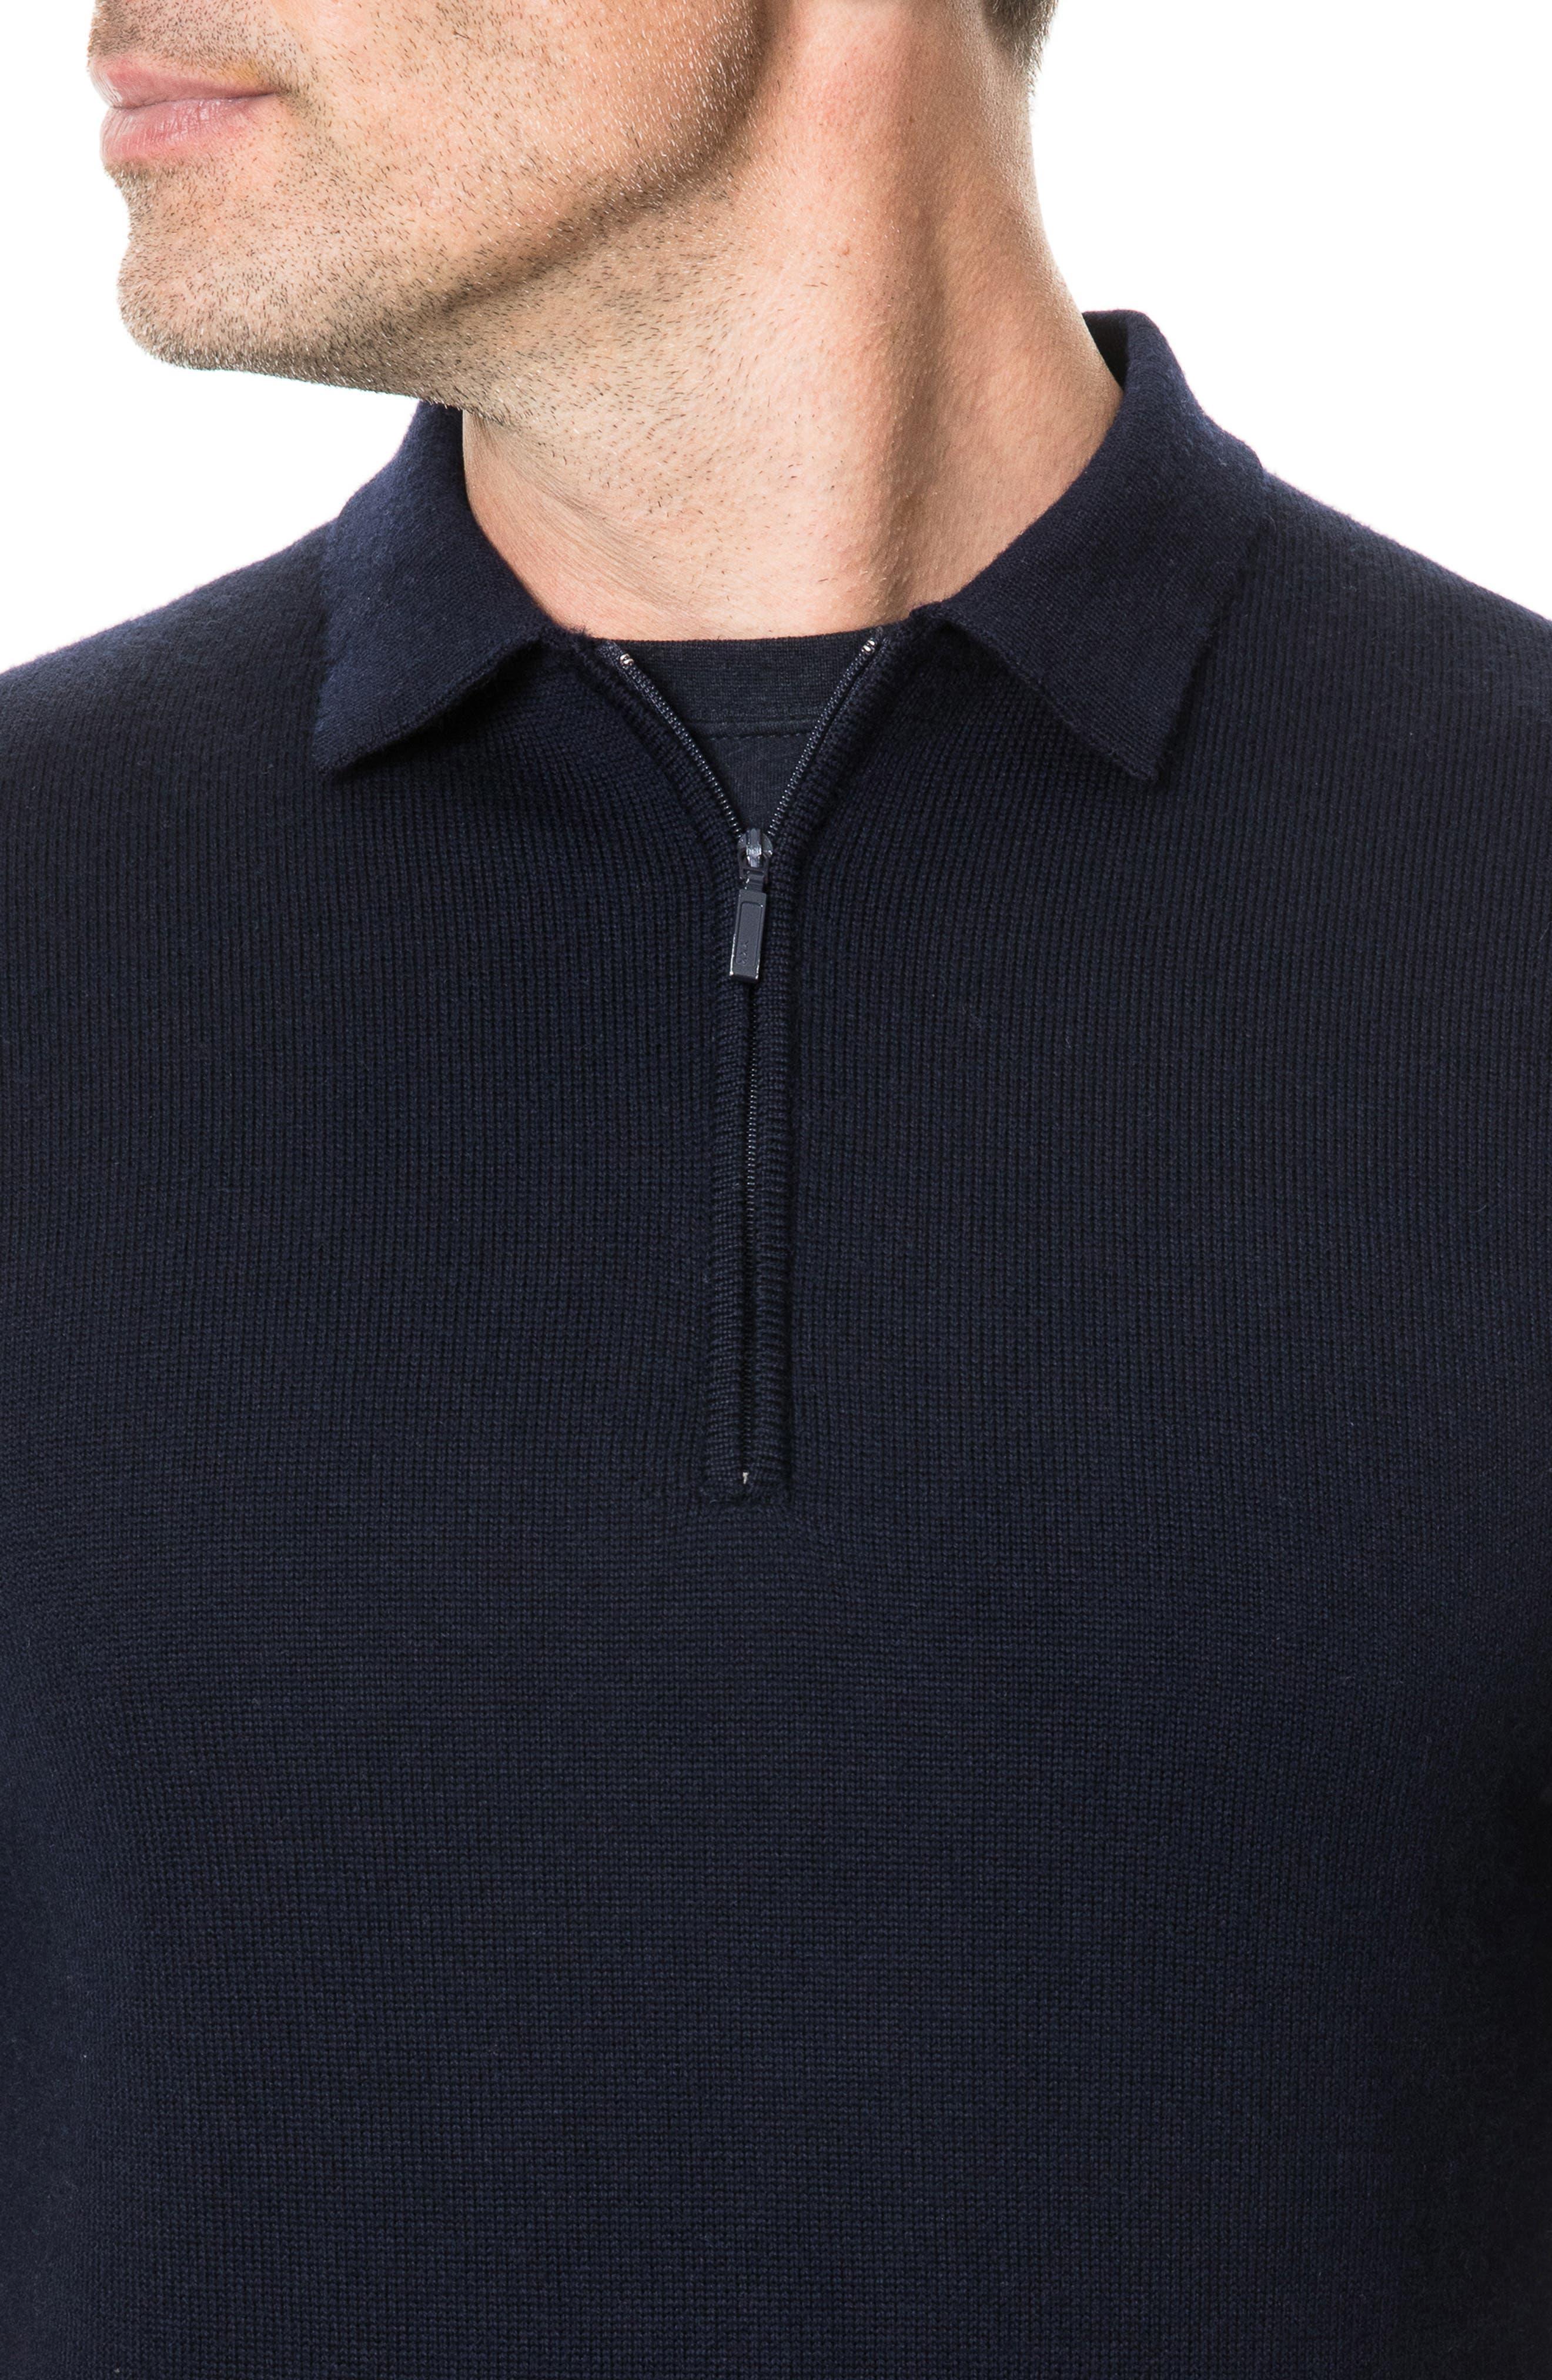 Revill Reserve Merino Wool Zip Polo,                             Alternate thumbnail 4, color,                             MARINE